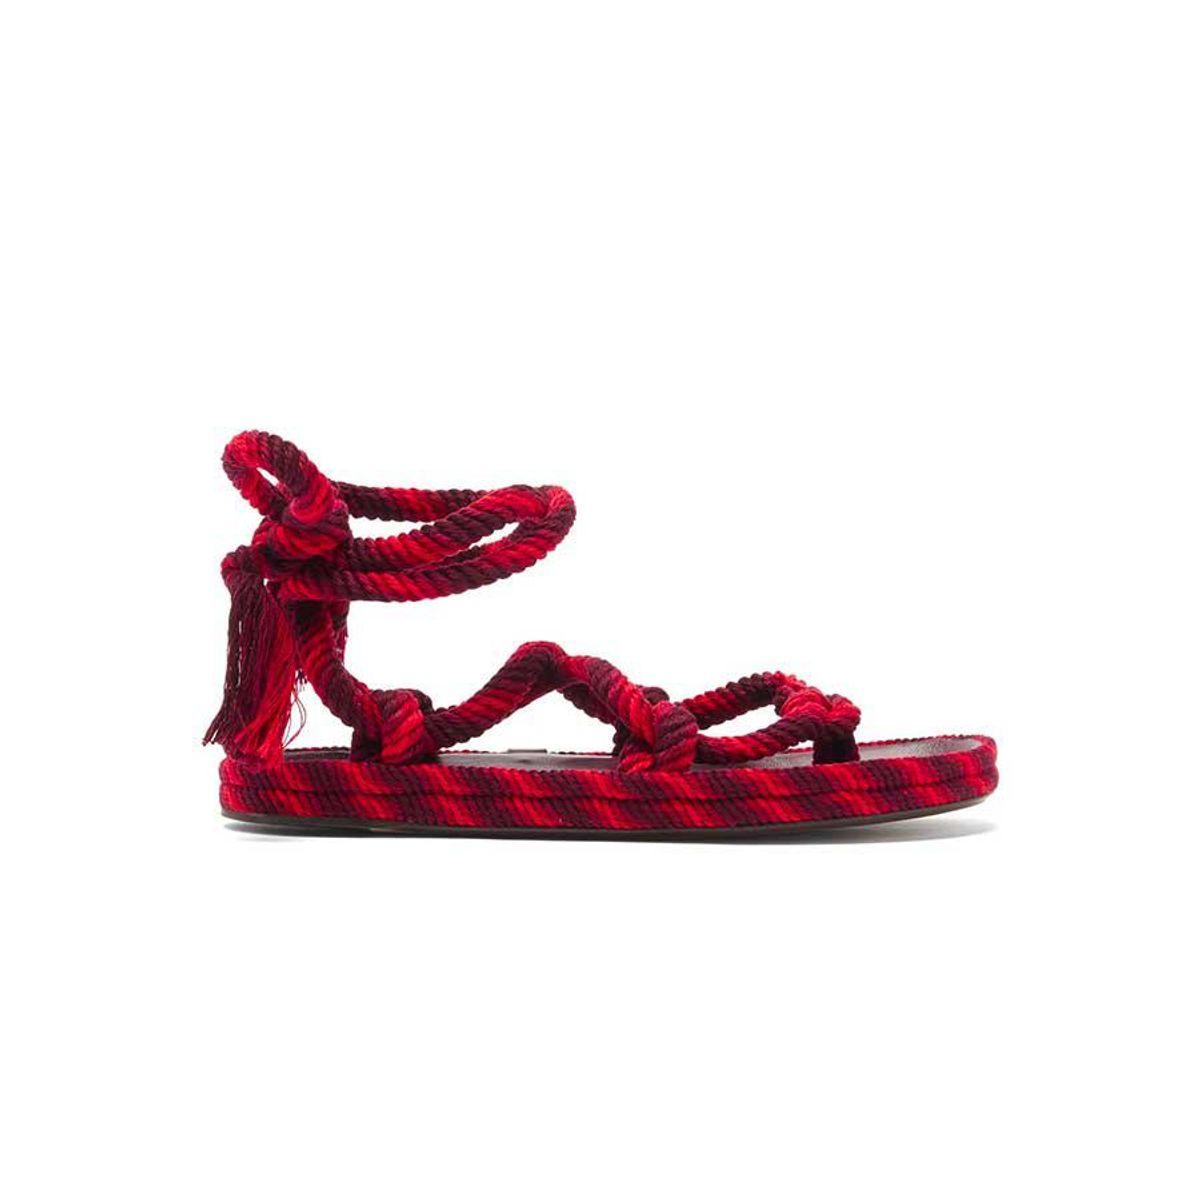 isabel marant erol rope sandals